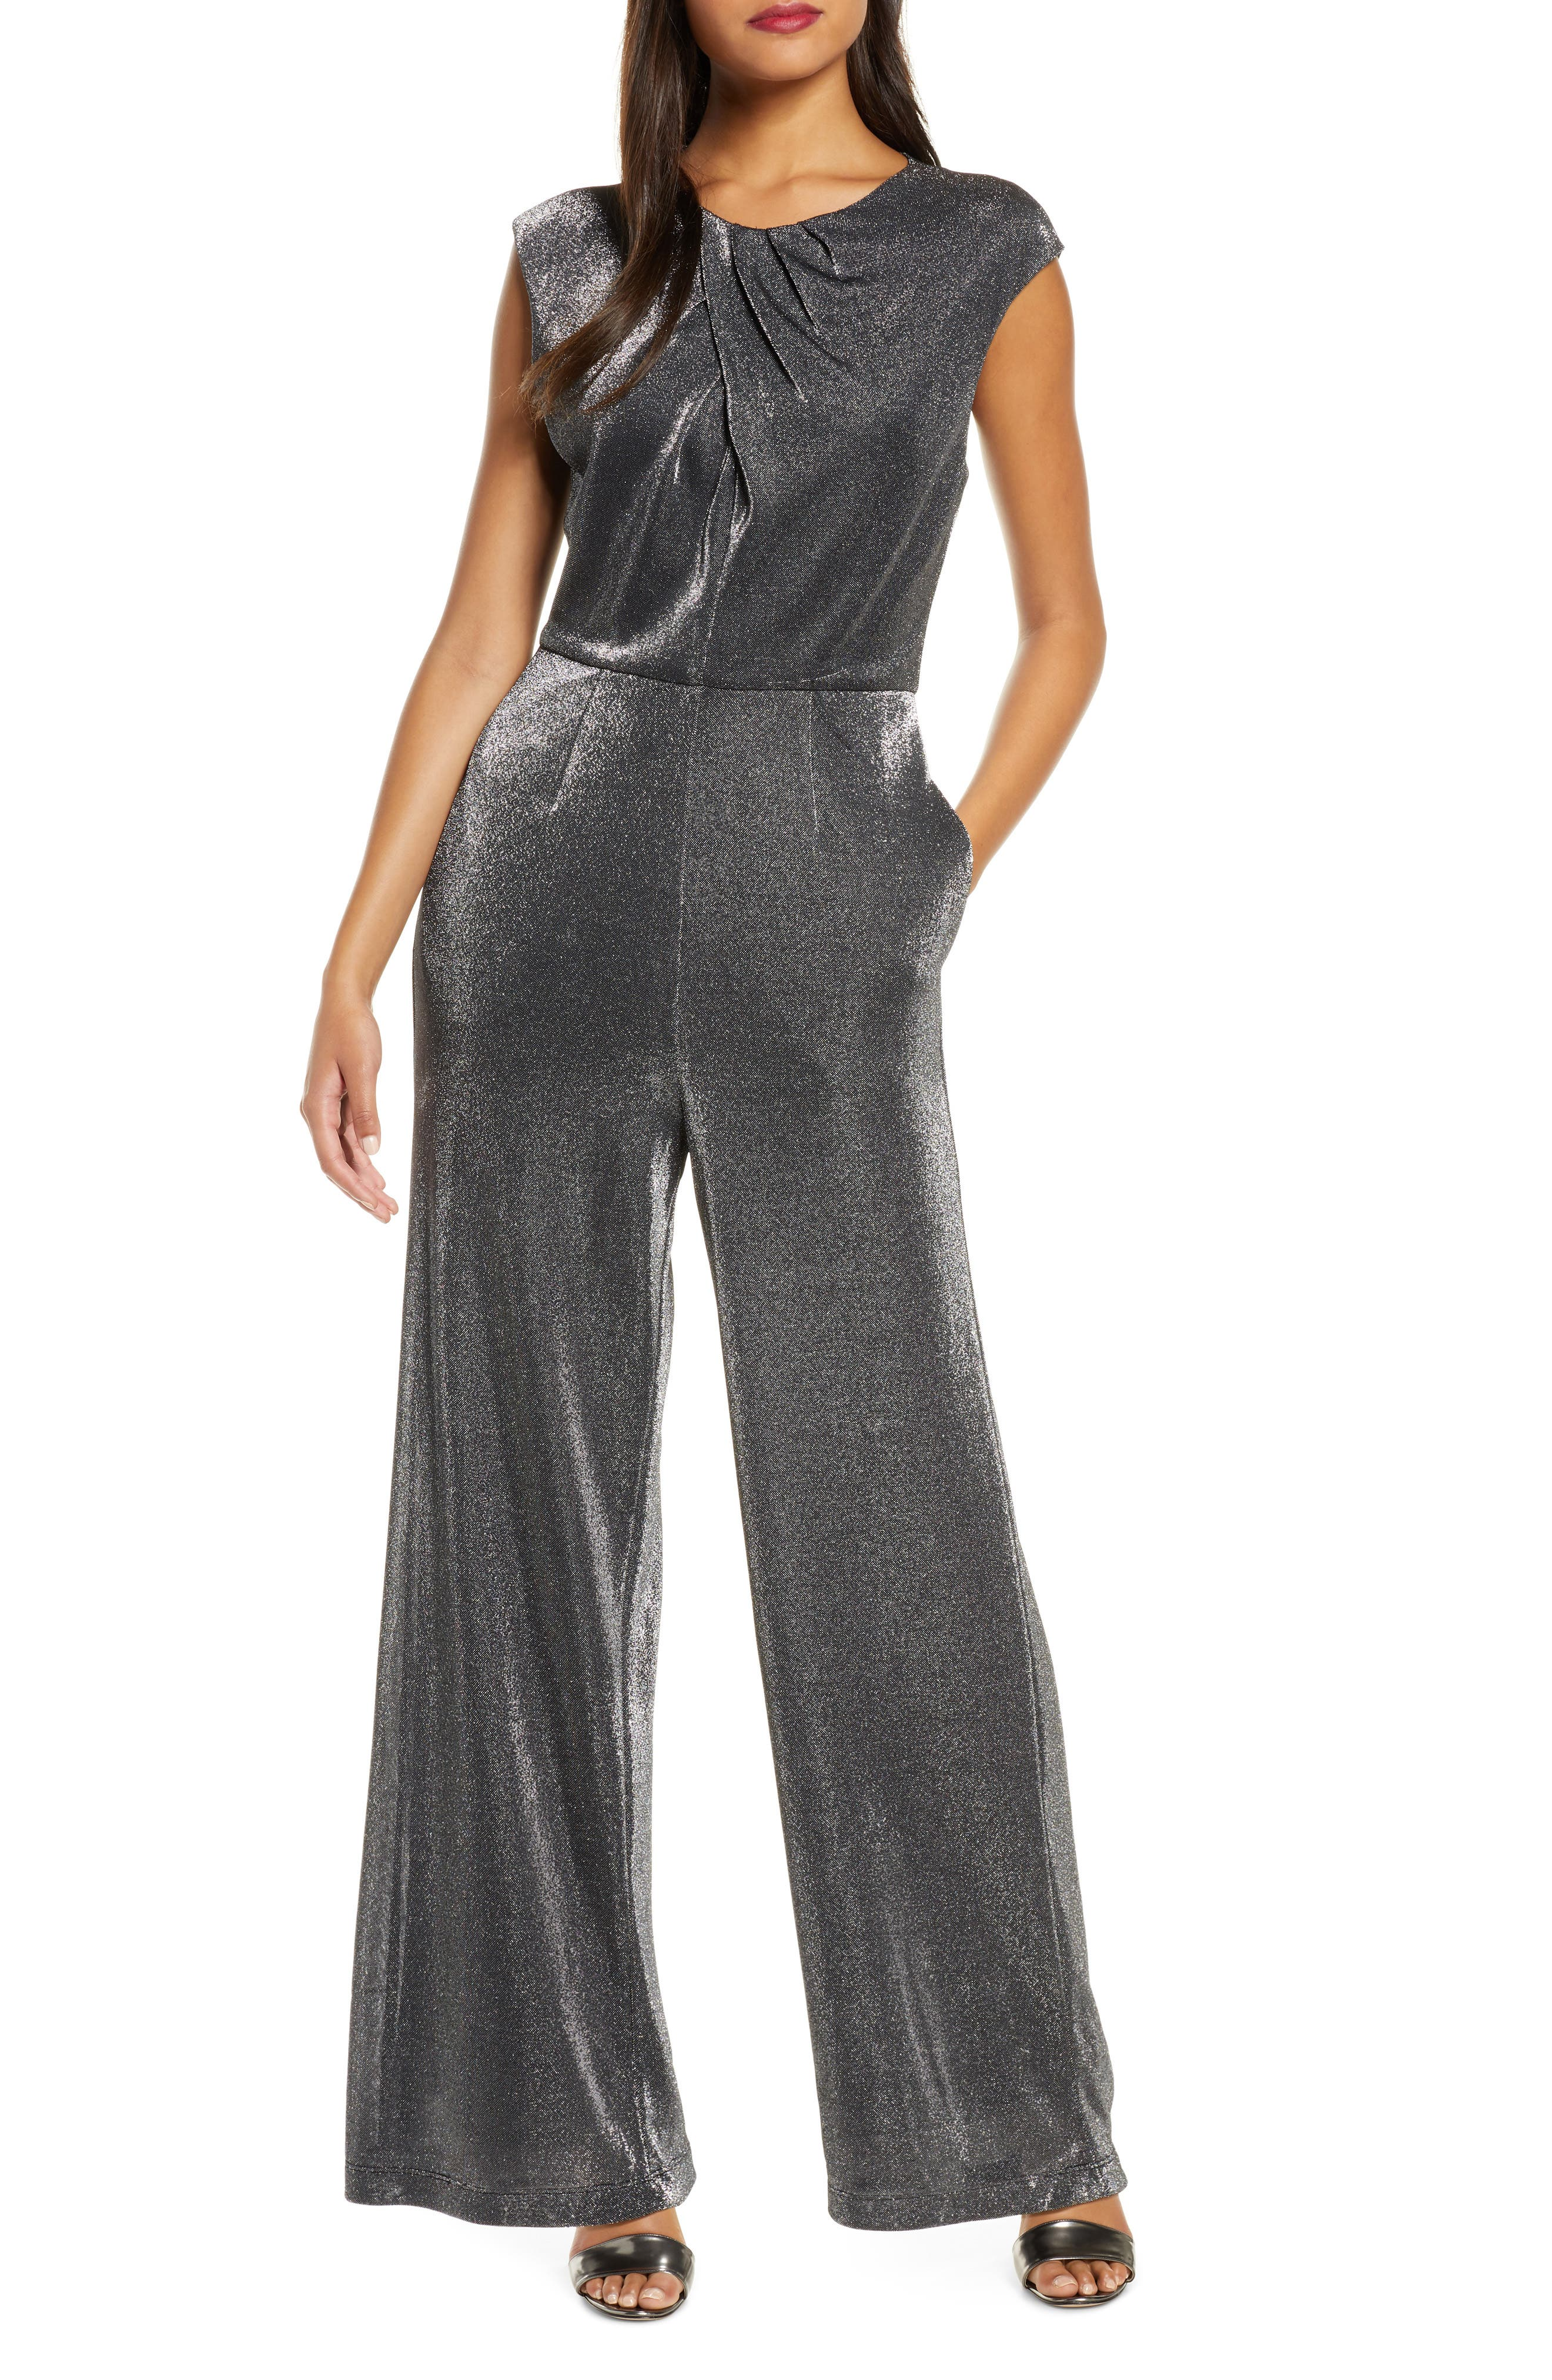 70s Jumpsuit   Disco Jumpsuits – Sequin, Striped, Gold, White, Black Womens Donna Ricco Metallic Cap Sleeve Wide Leg Jumpsuit $138.00 AT vintagedancer.com